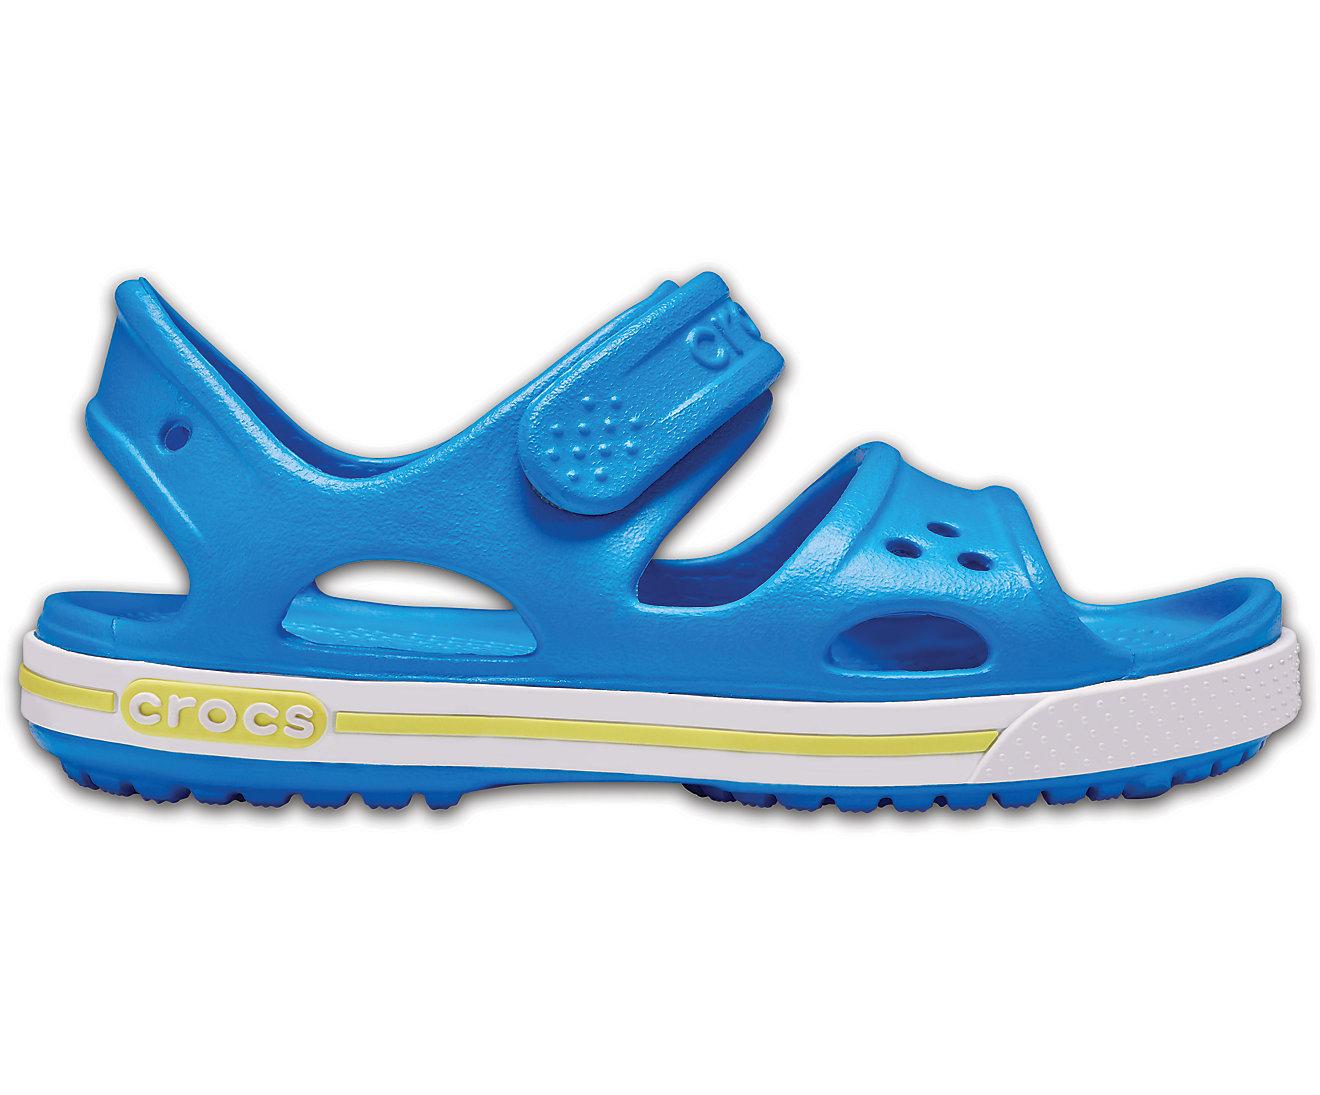 ff7aba08d9b Crocs Crocband II Sandal 23-24 (C7)   Ocean Tennis Ball Green - Glami.cz